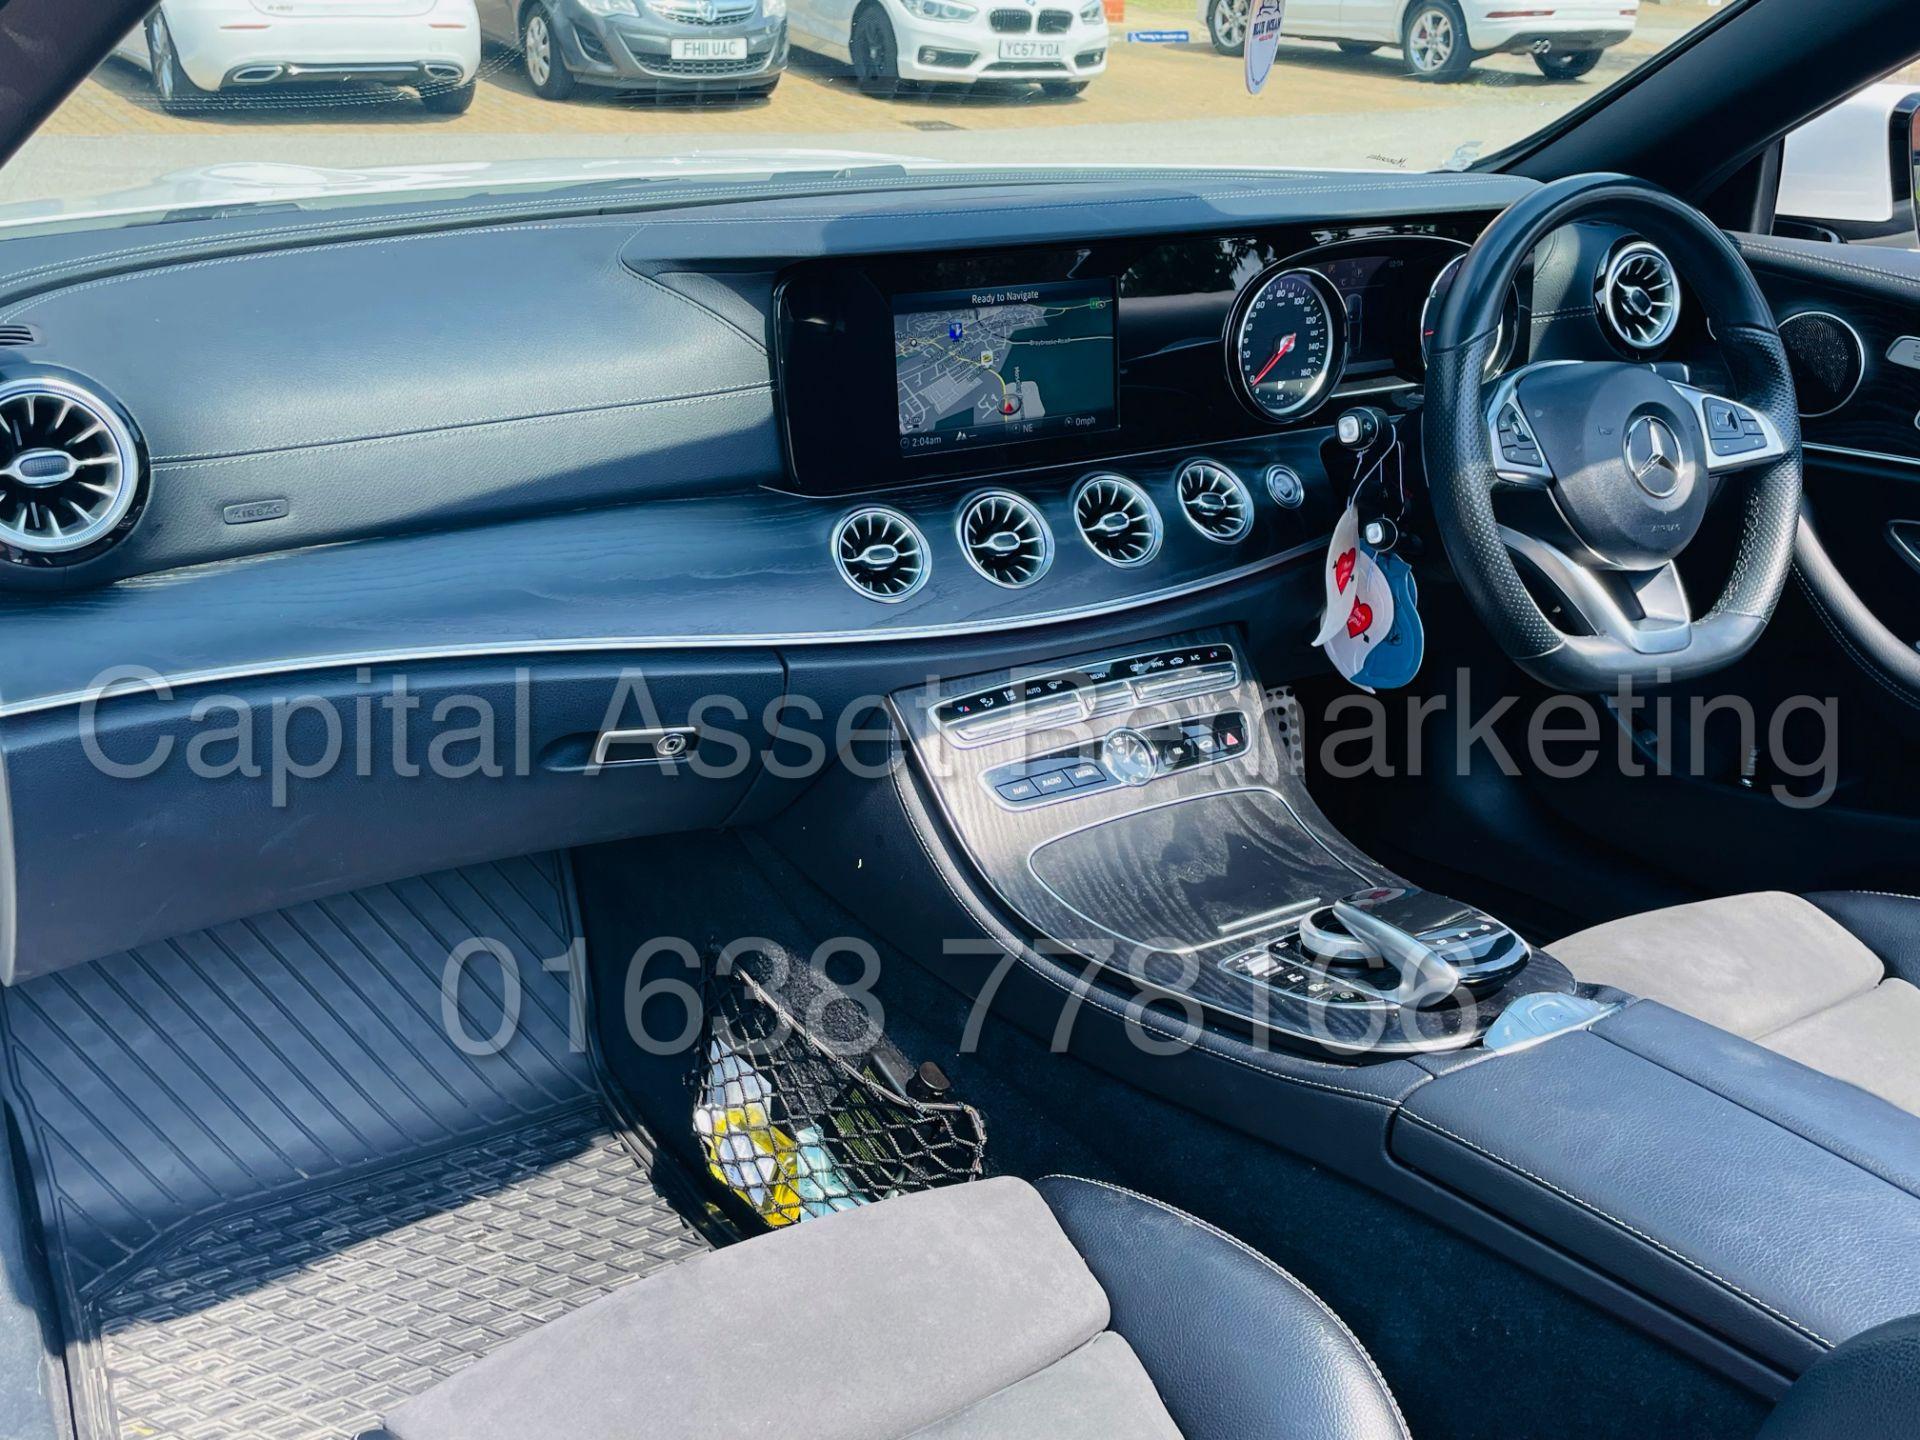 MERCEDES-BENZ E220d *AMG LINE PREMIUM - CABRIOLET* (2018 - EURO 6) '9G AUTO - LEATHER - SAT NAV' - Image 36 of 63